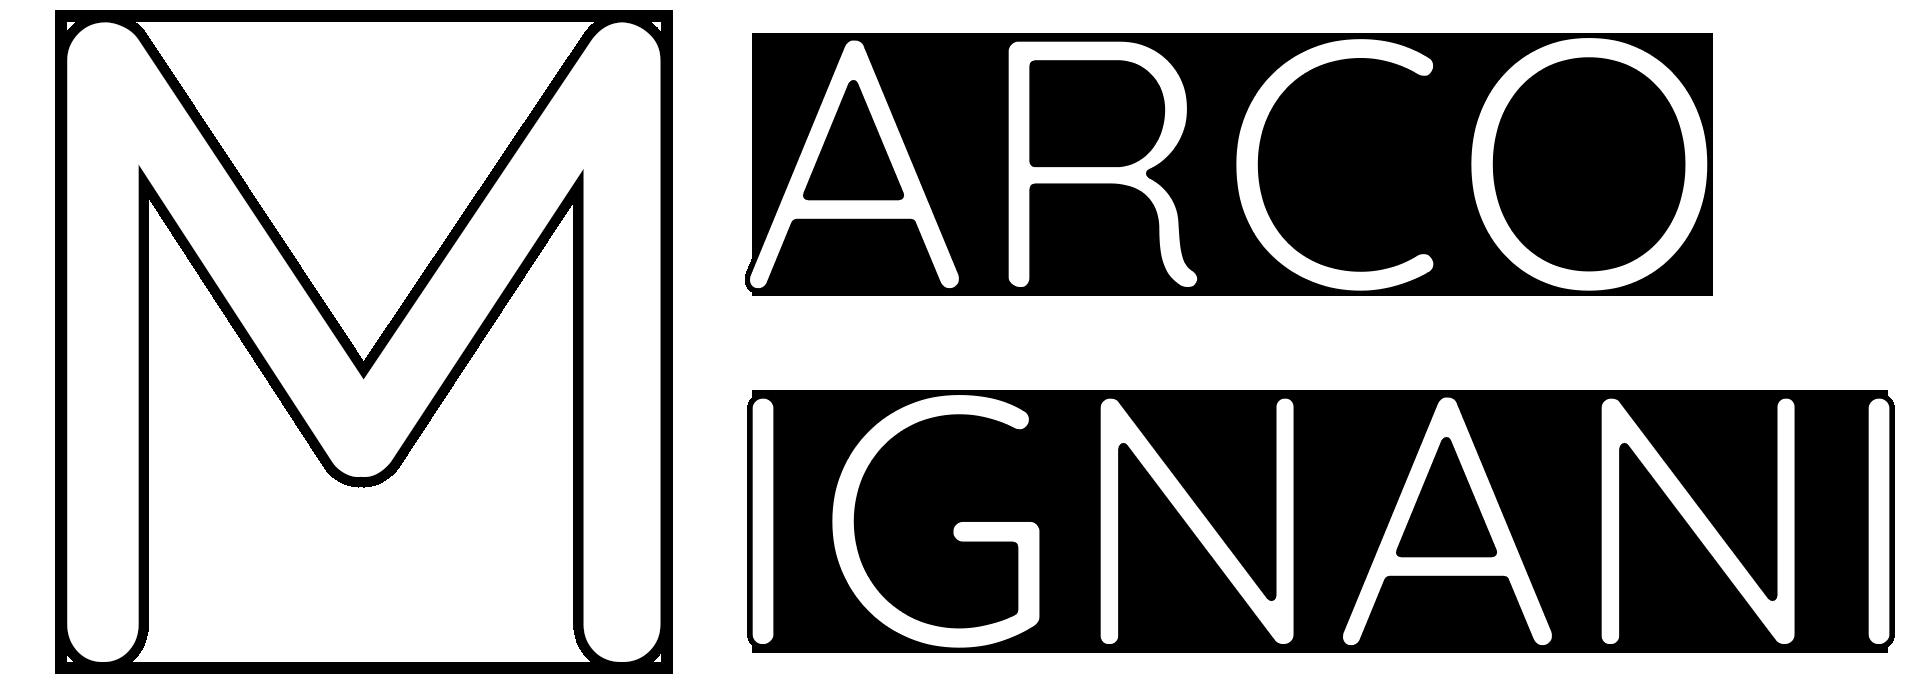 marco-mignani-logo